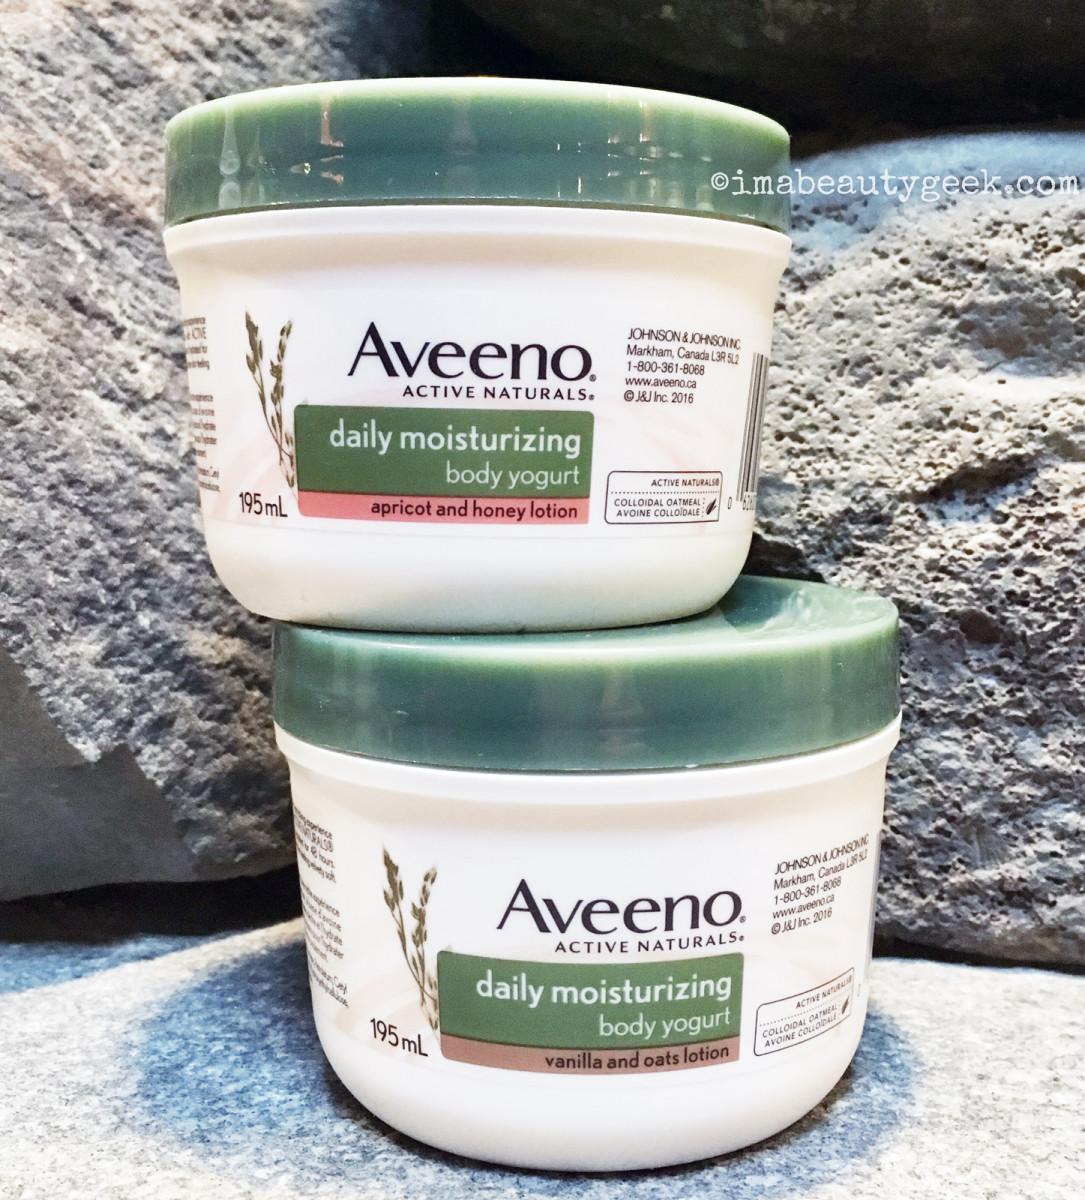 Aveeno Daily Moisturizing Body Yogurt Beautygeeks Acnes Natural Care Face Wash